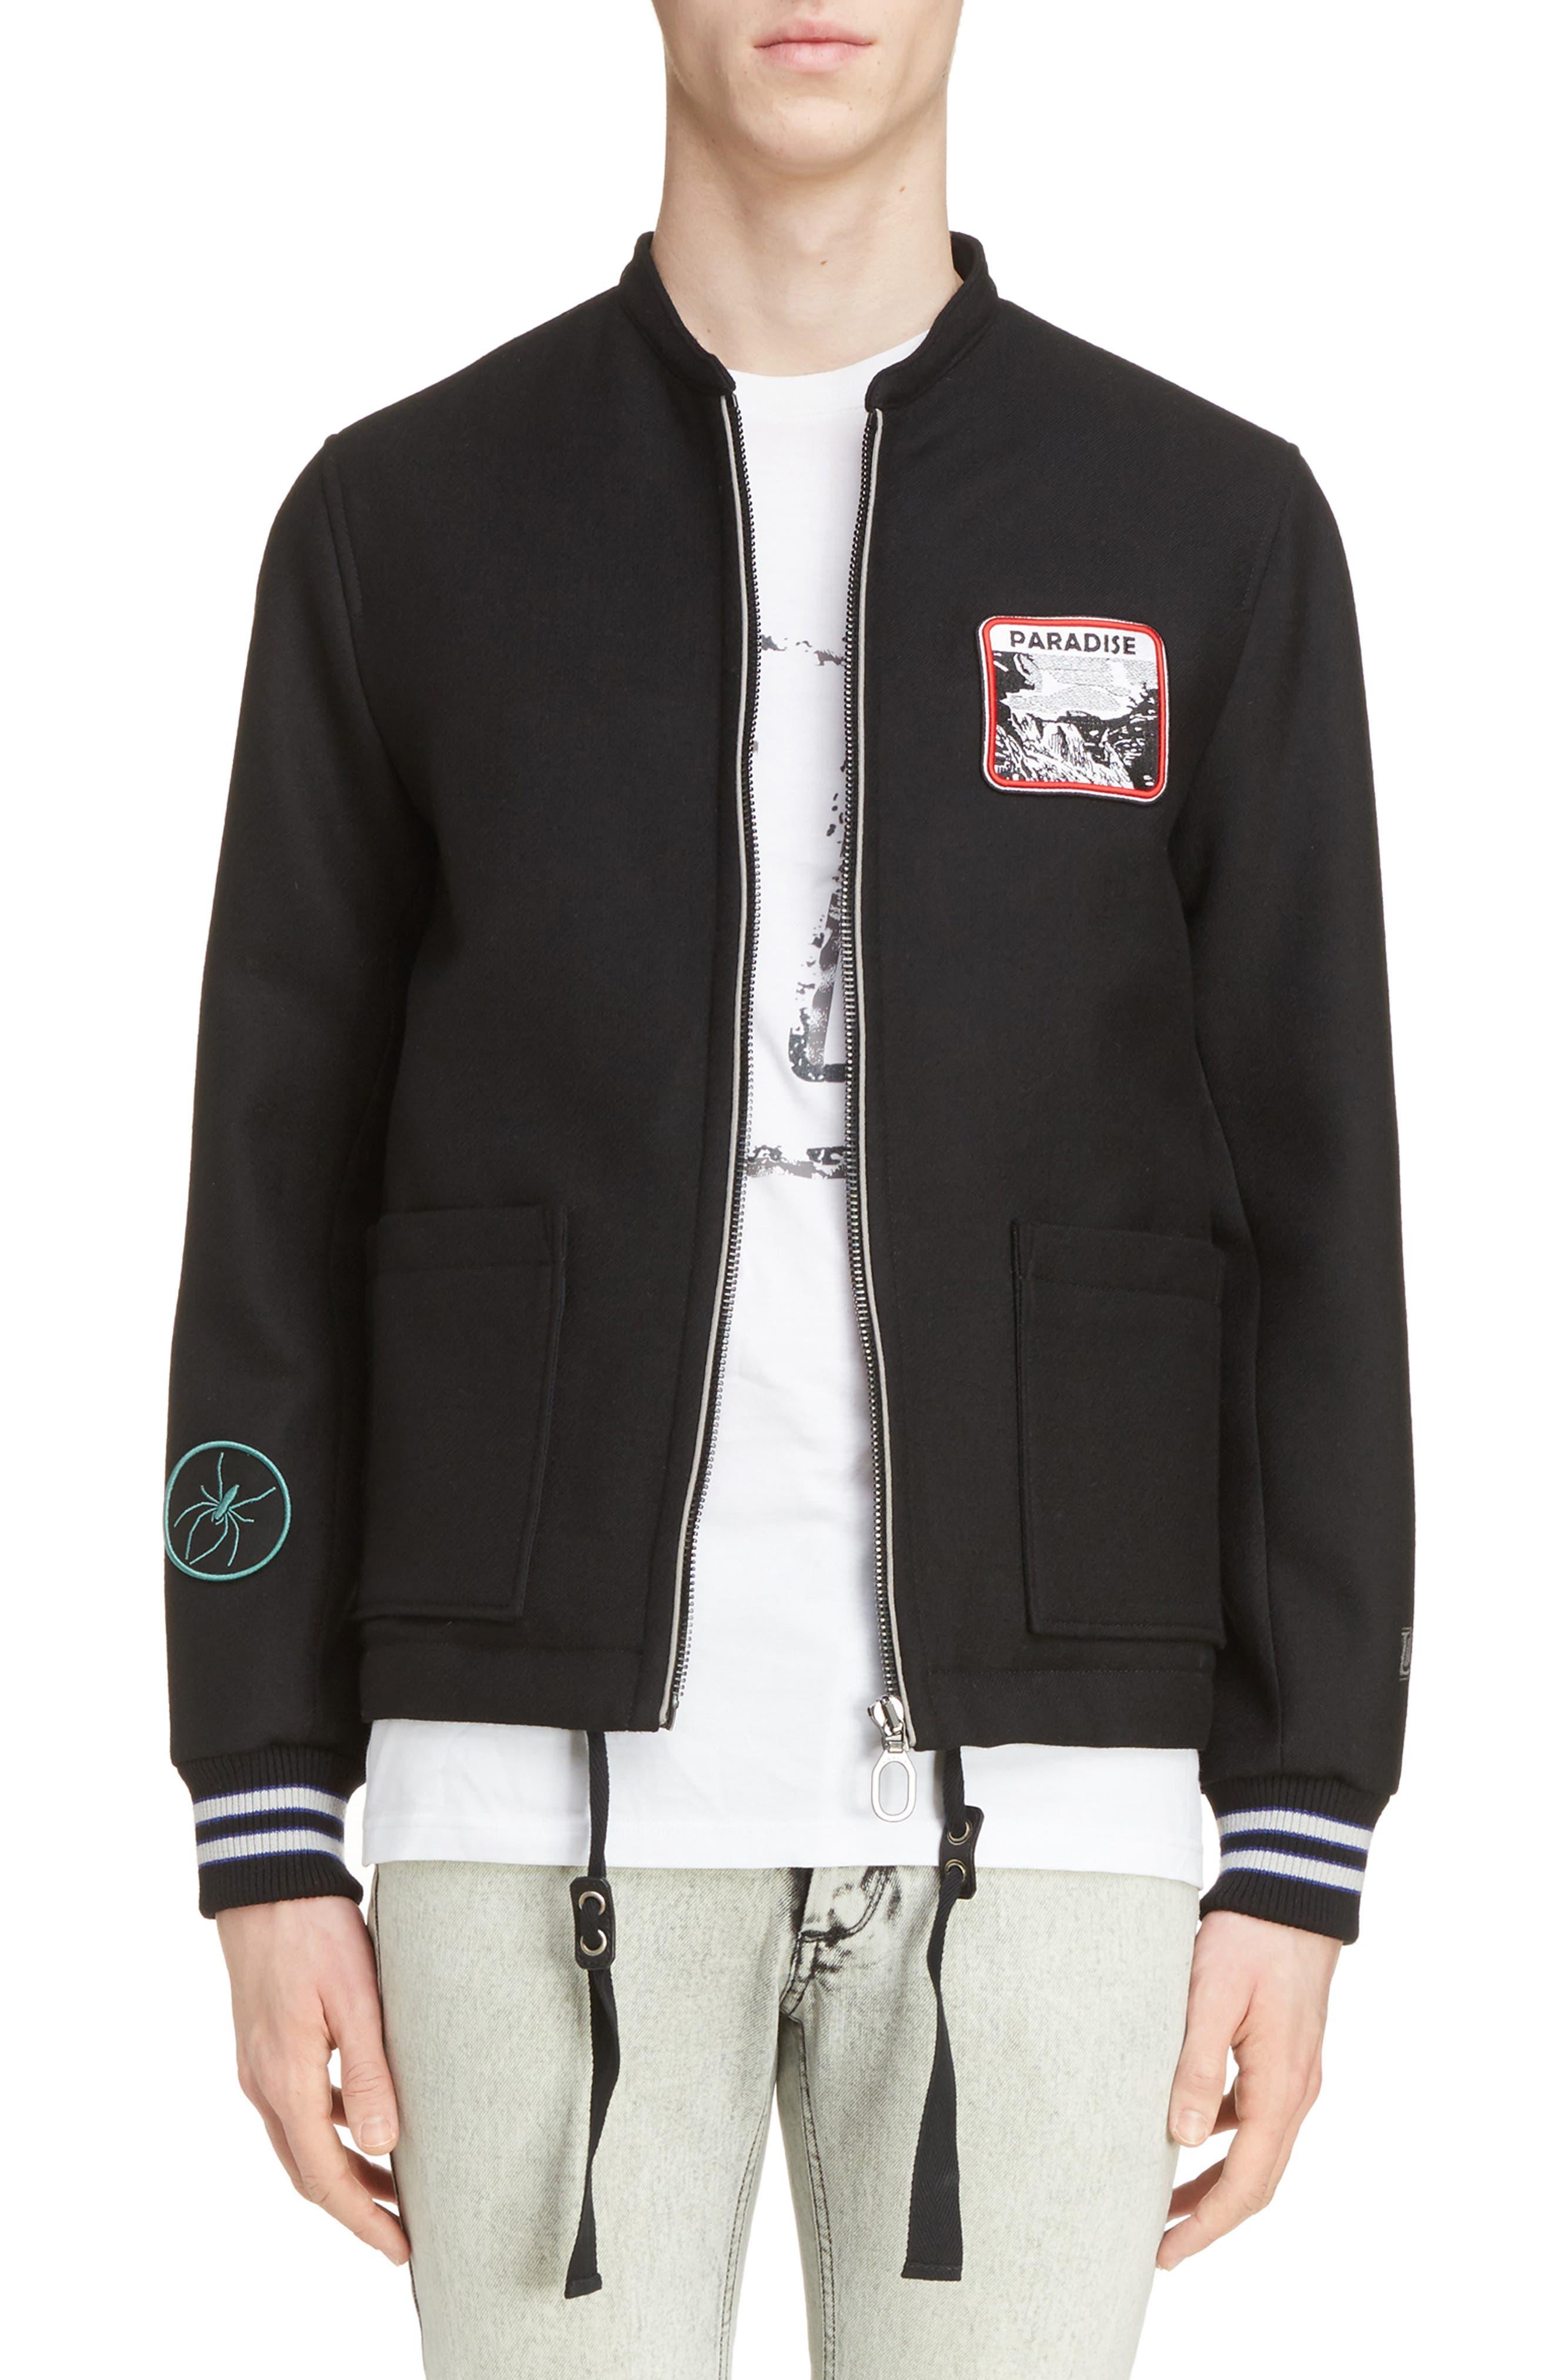 Lanvin Paradise Patch Bomber Jacket